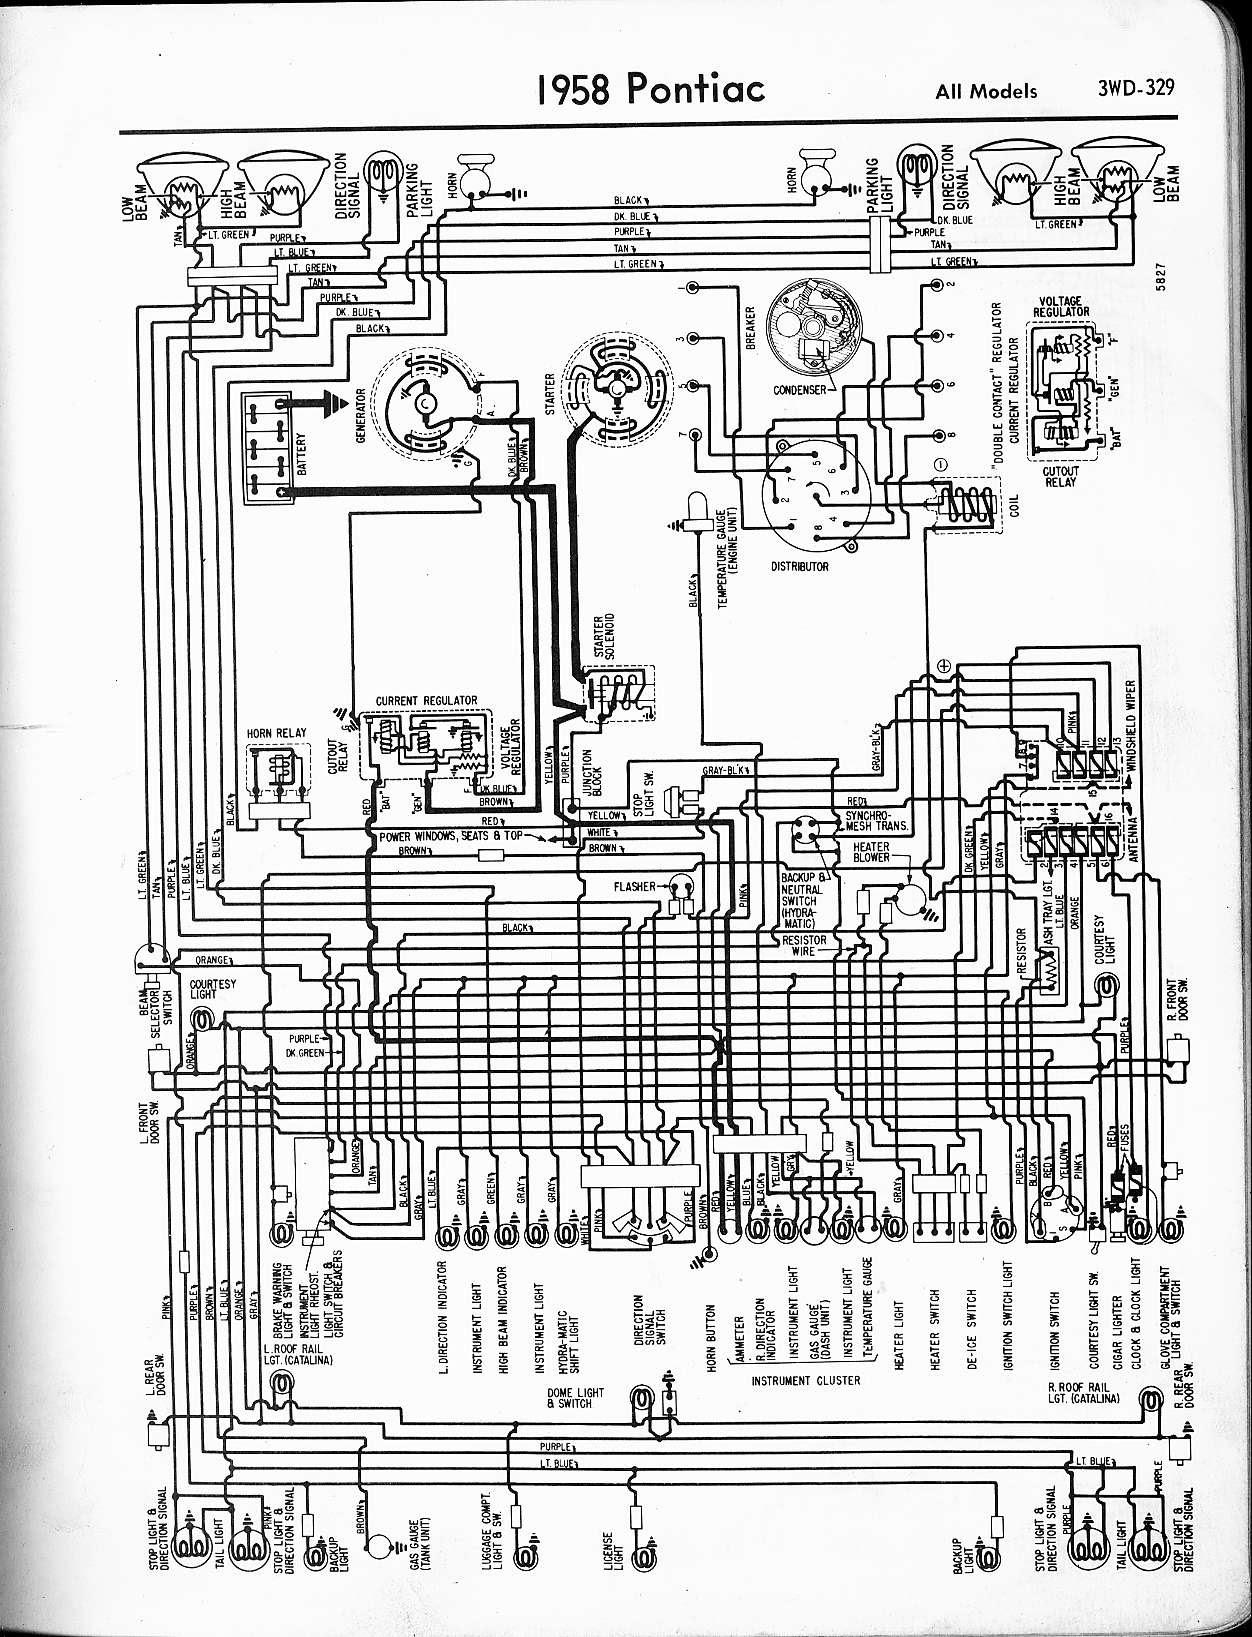 1963 Pontiac Wiring Diagram Wiring Diagram Modernize Modernize Frankmotors Es